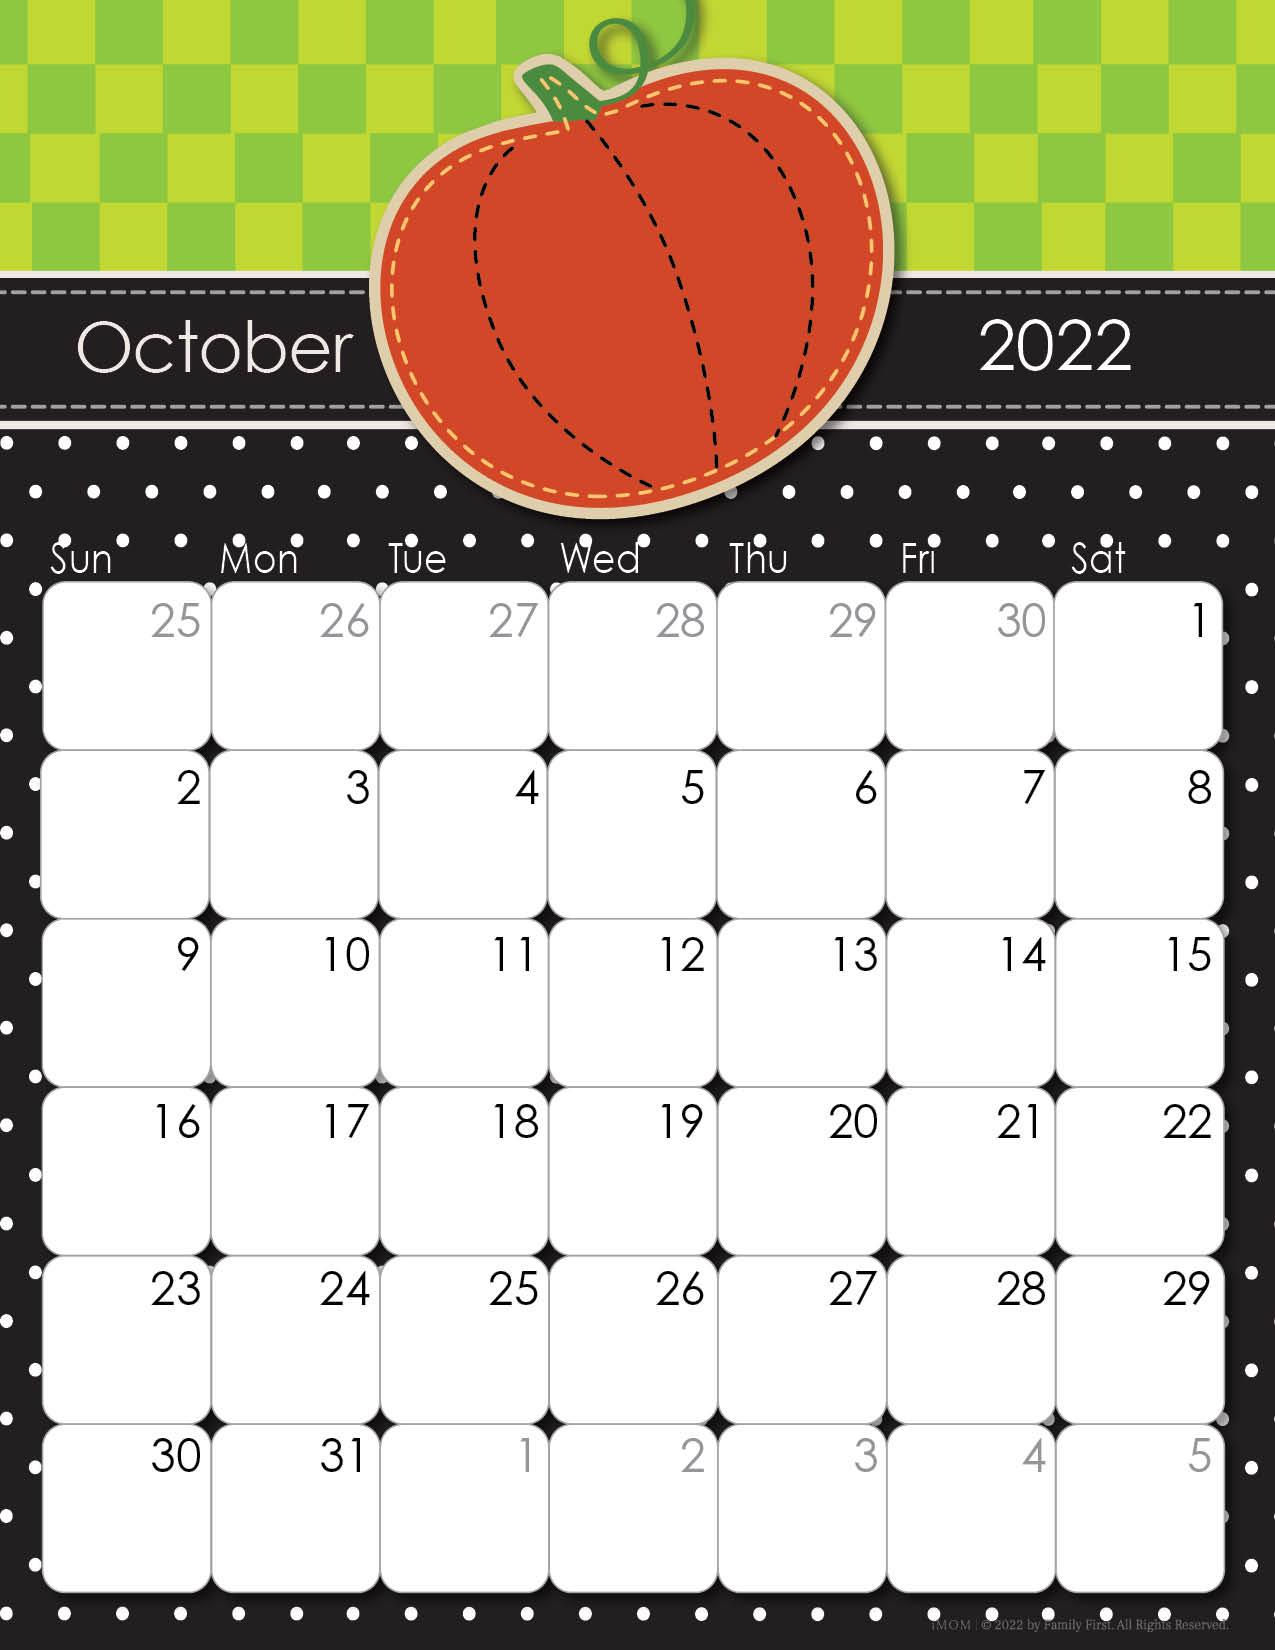 w2022 himsical printable calendar